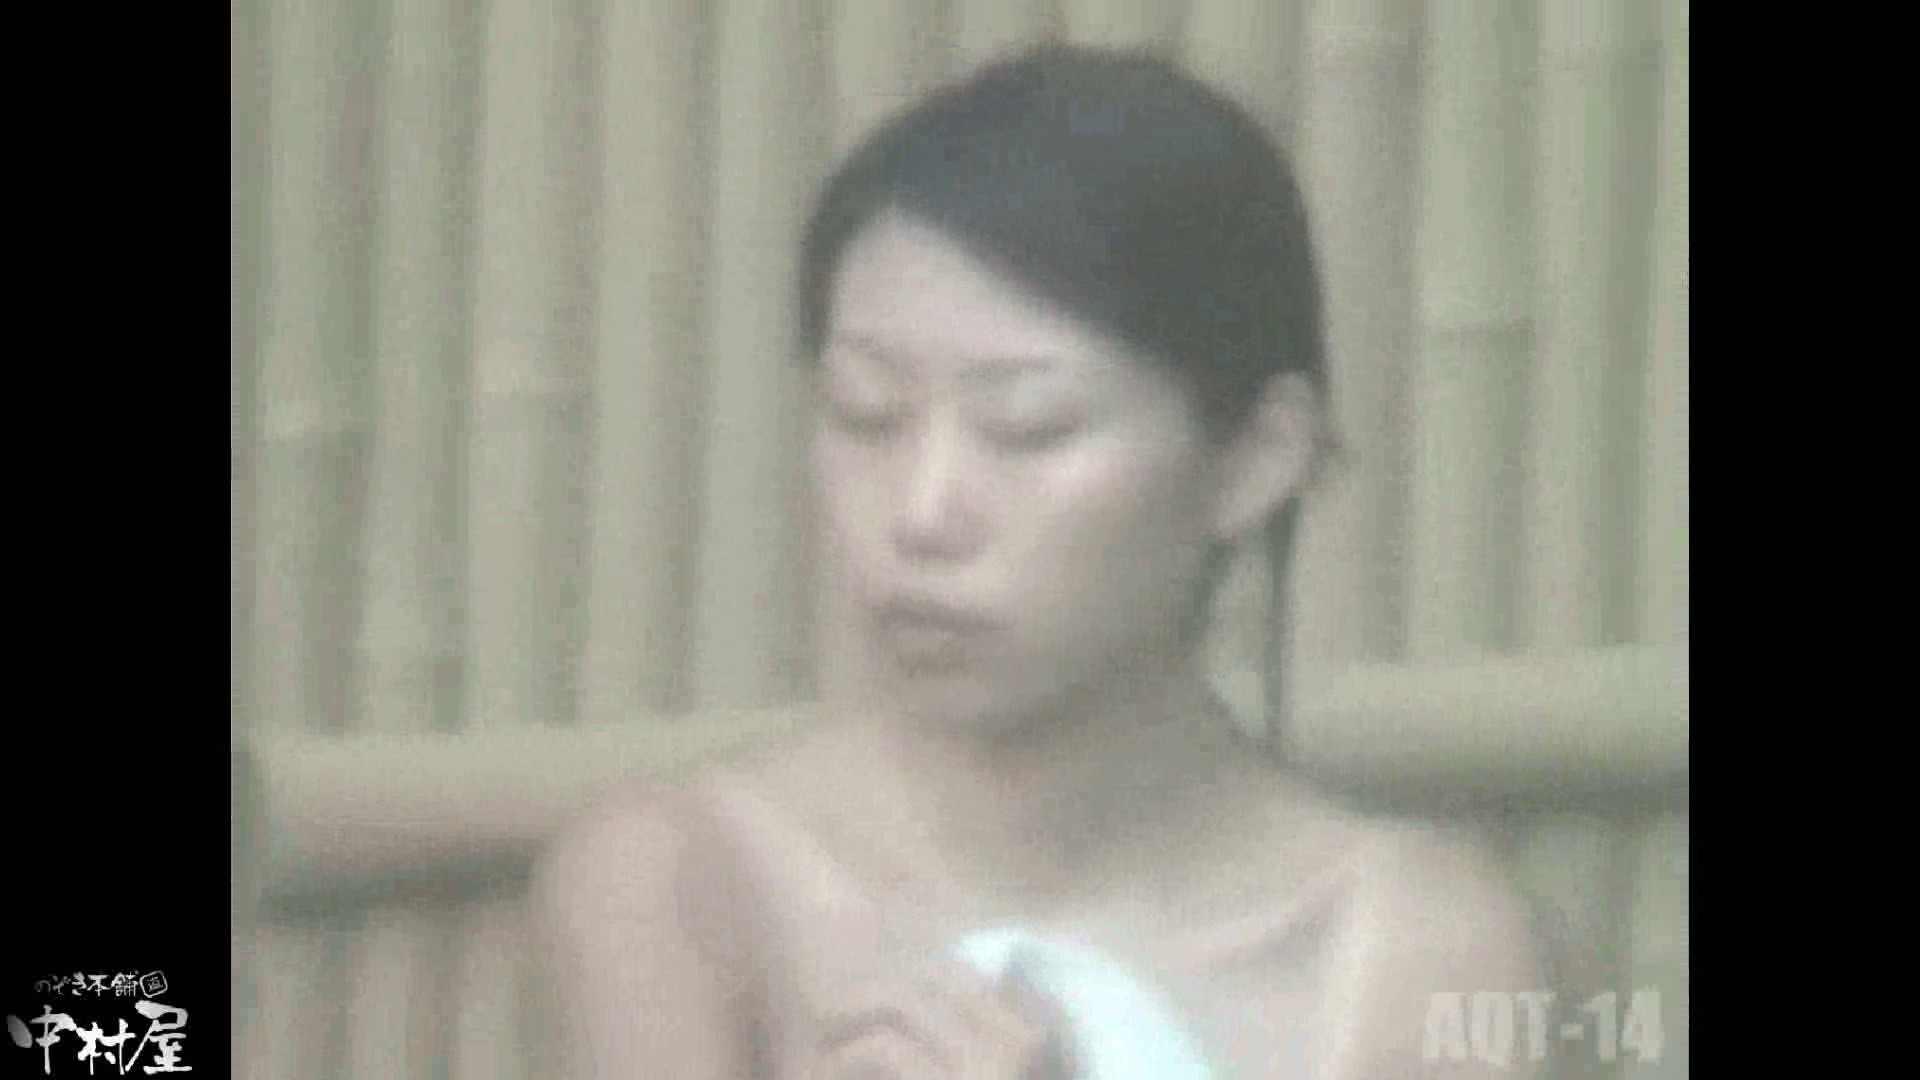 Aquaな露天風呂Vol.878潜入盗撮露天風呂十四判湯 其の一 潜入画像   露天  59画像 47